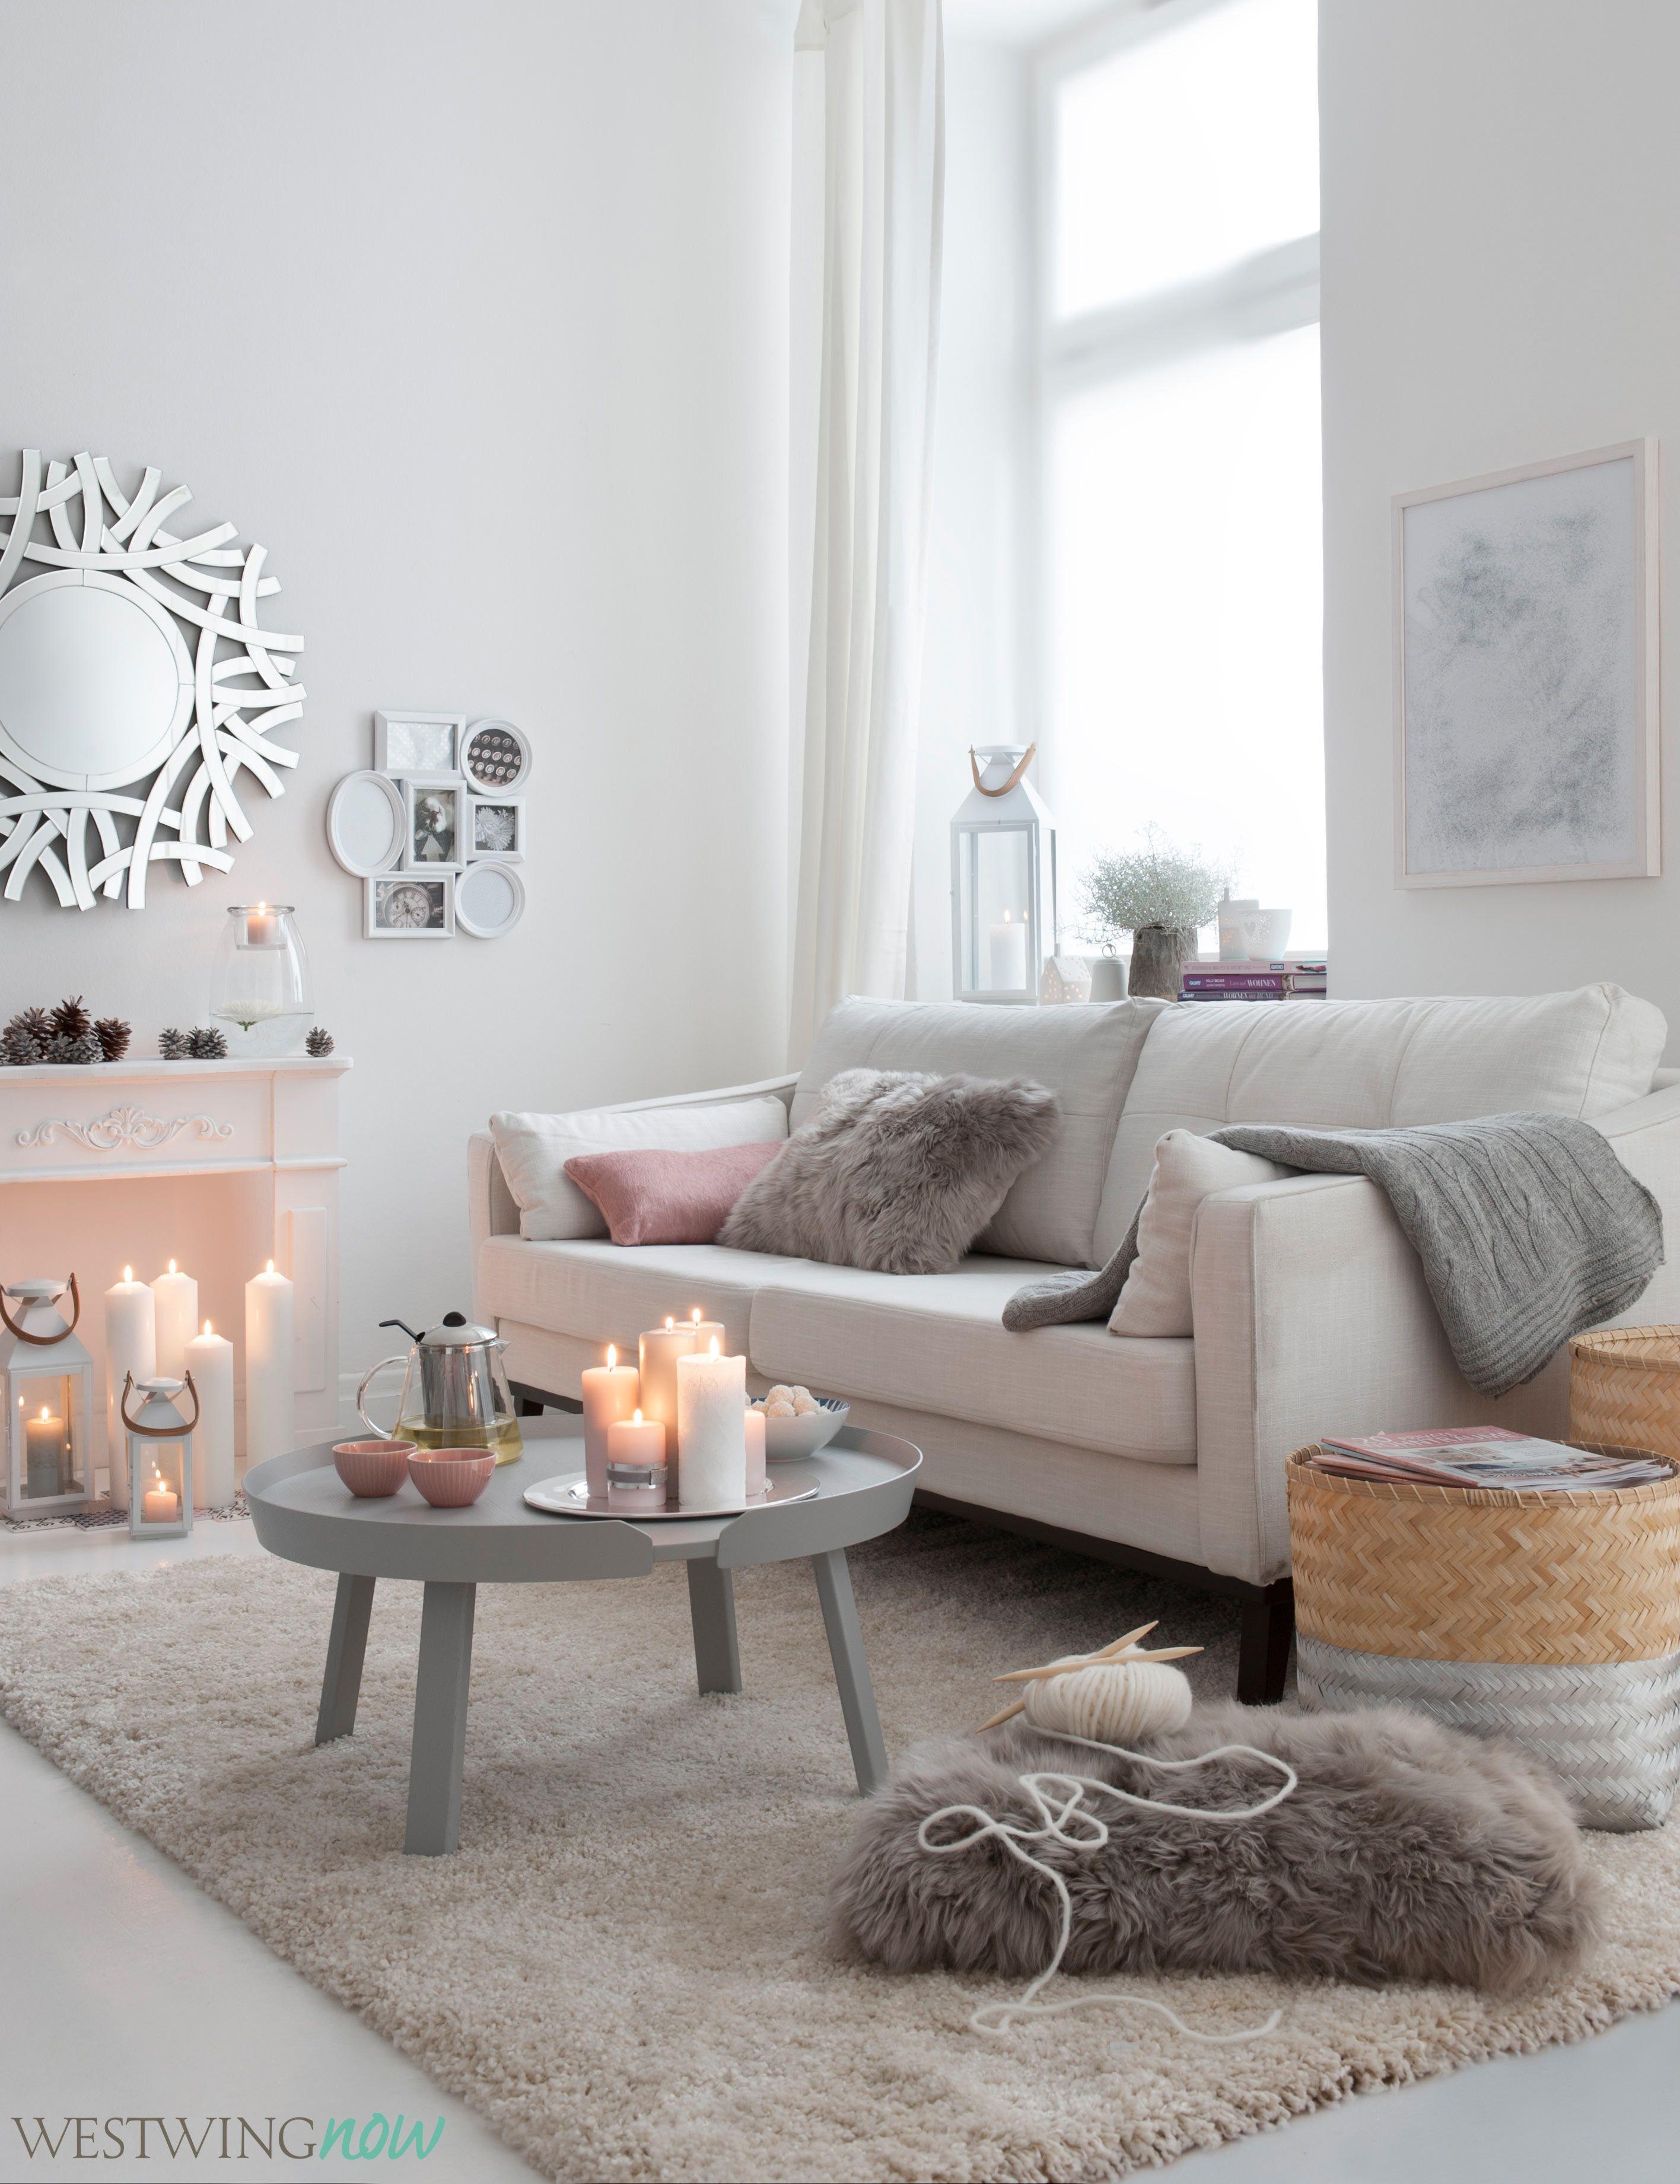 Pin de Melanie Pape en Home Living Pinterest